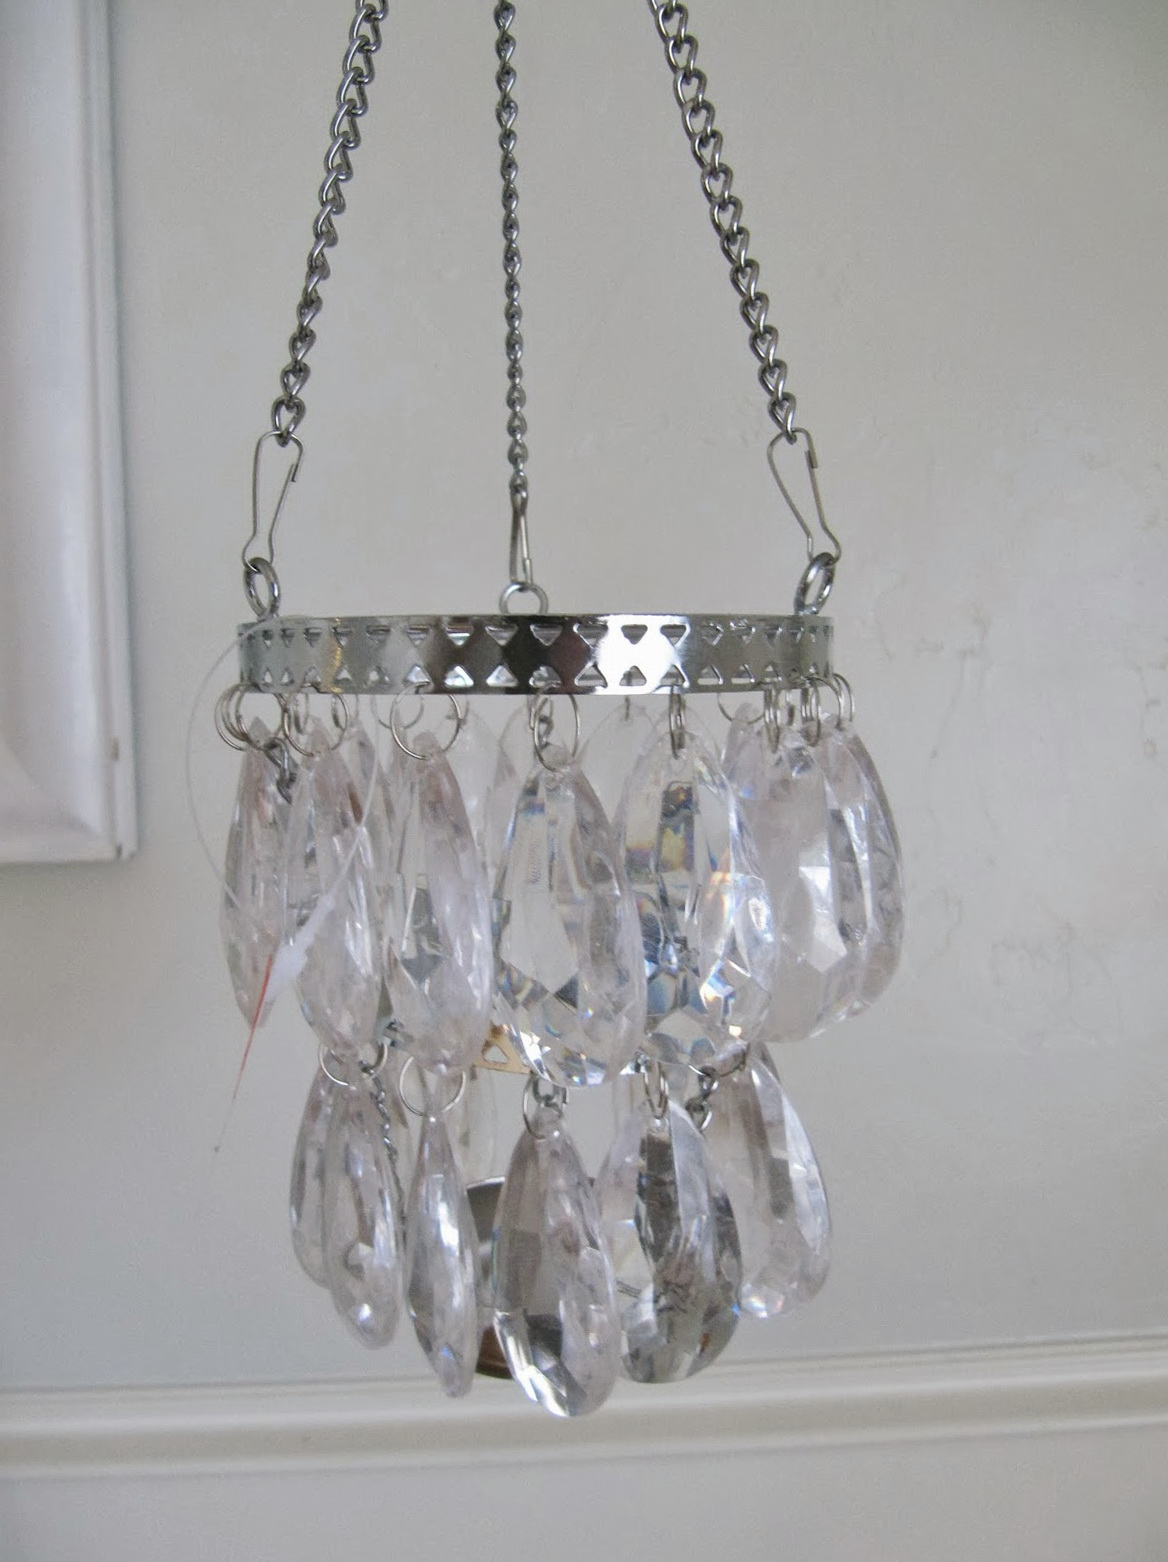 Hanging Tea Light Candle Chandelier Home Design Ideas